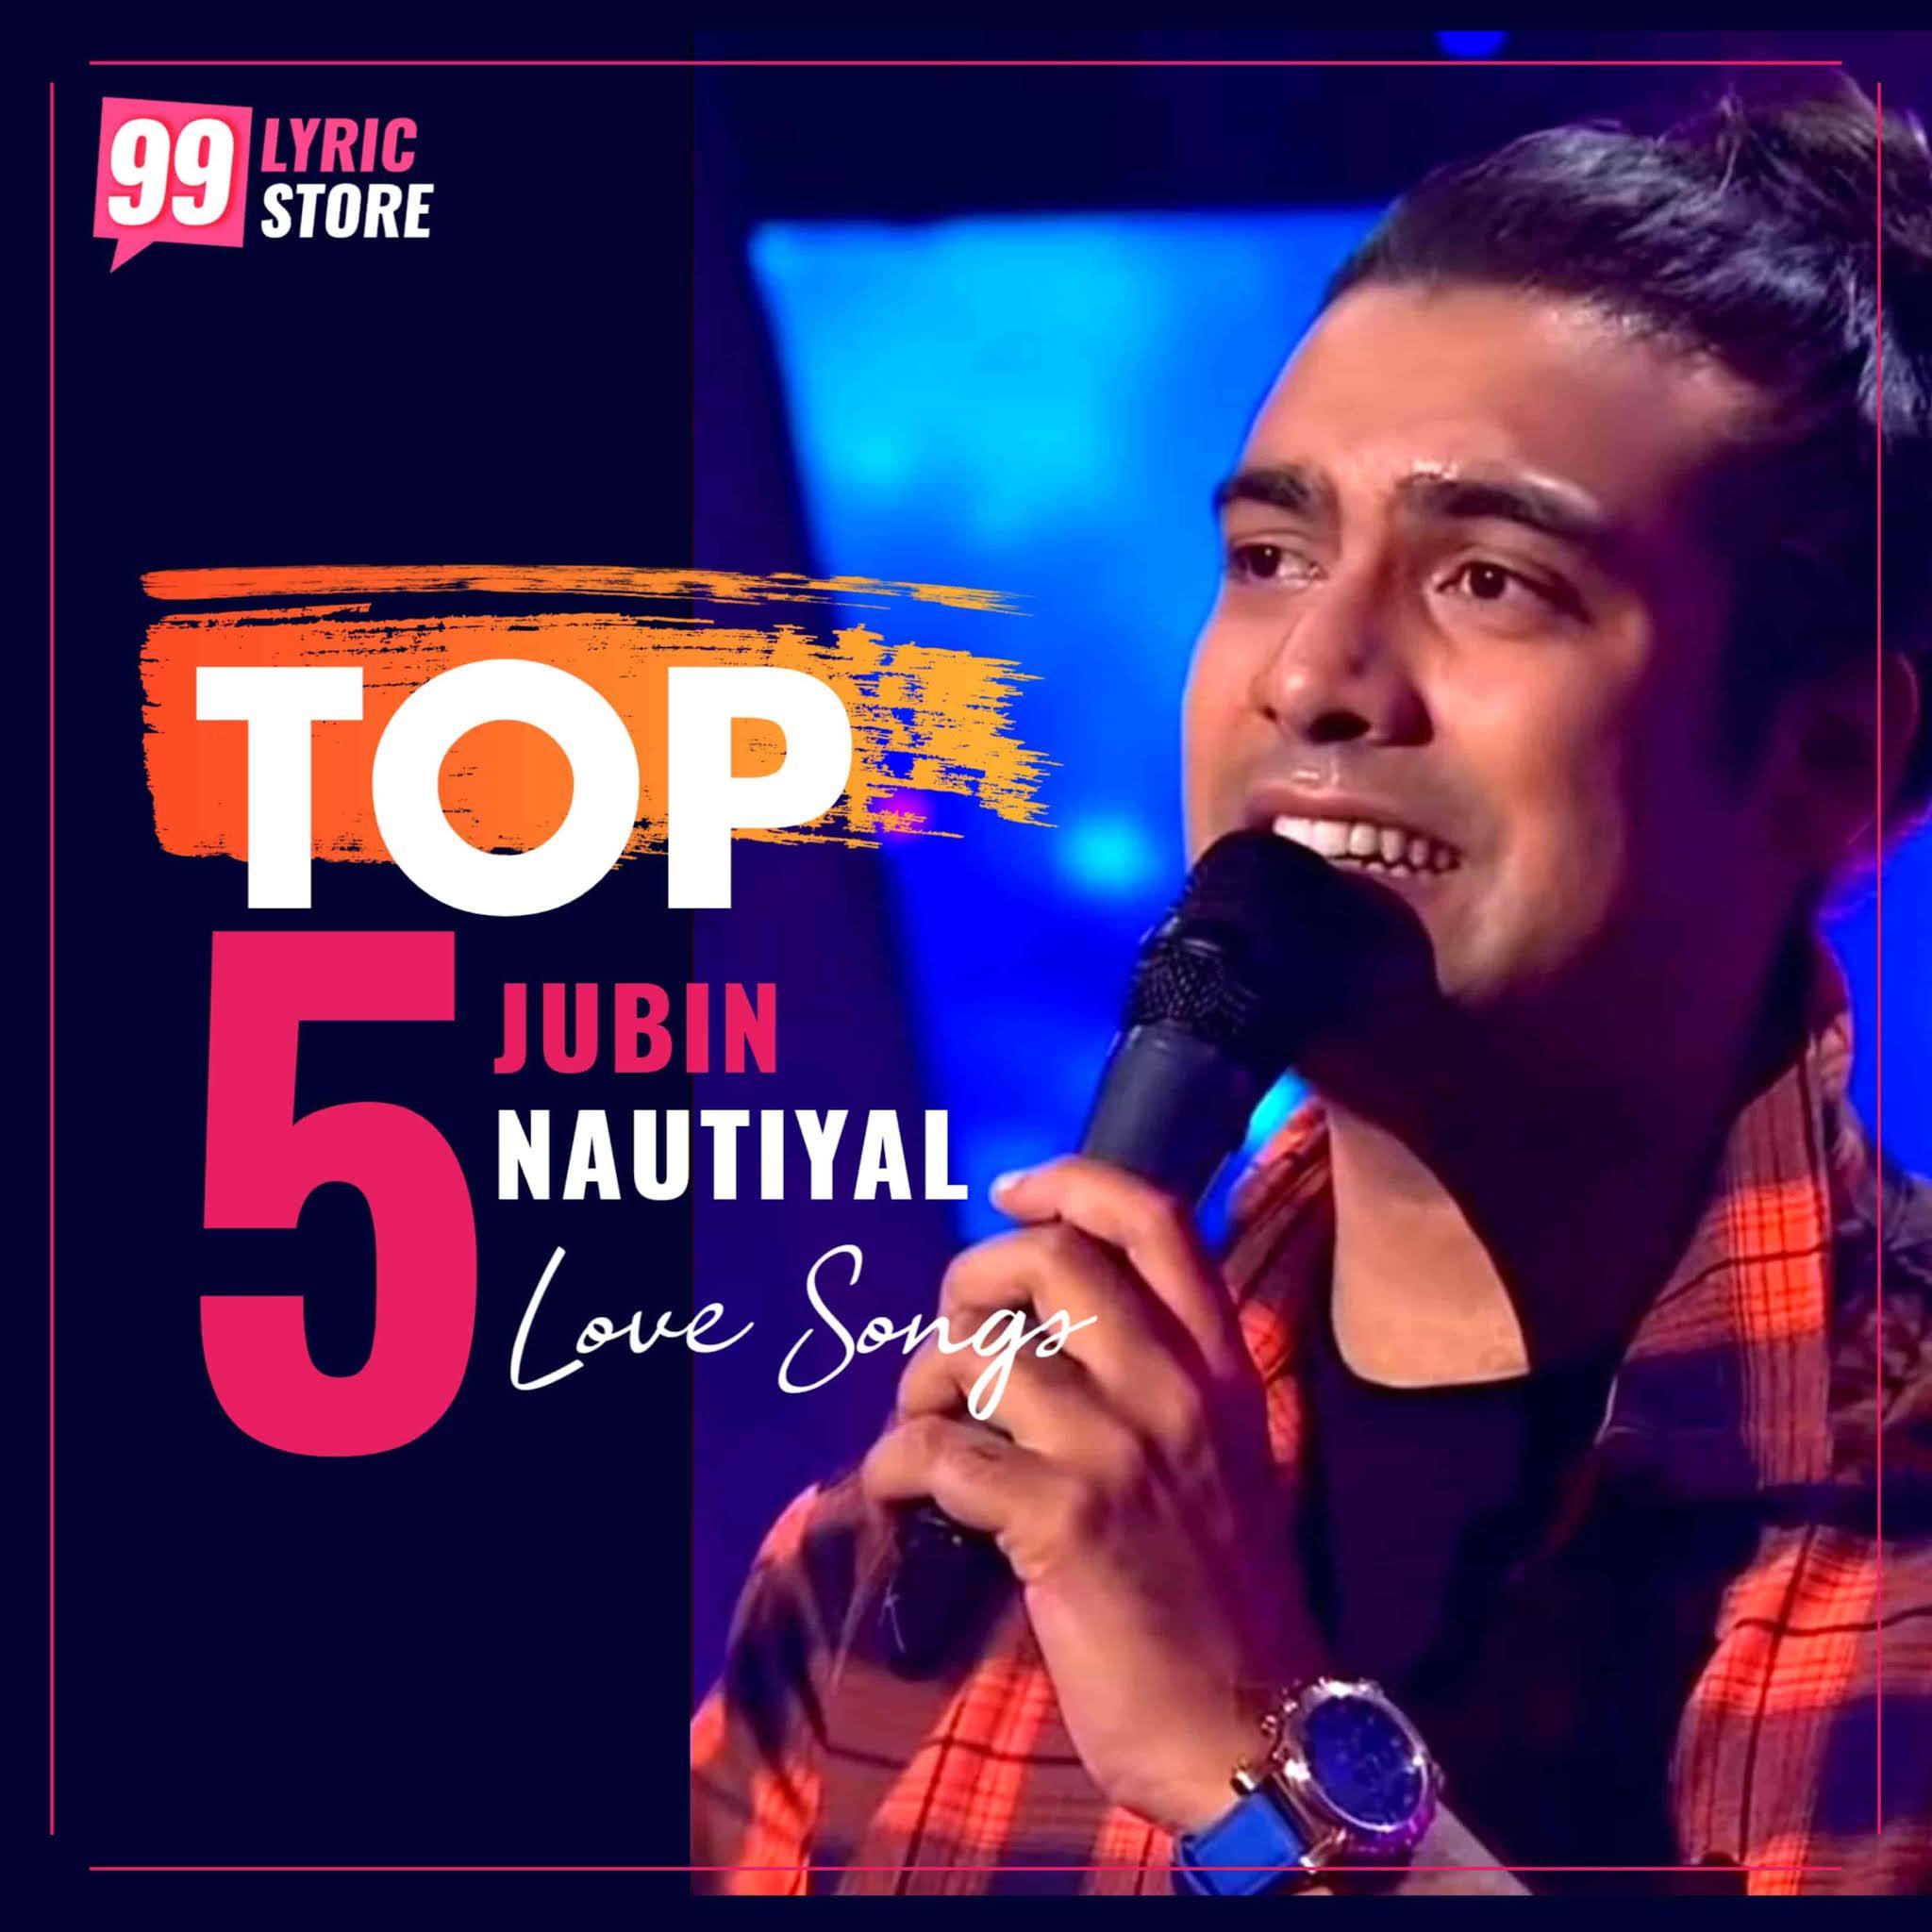 Top 5 Jubin Nautiyal Love Songs image.